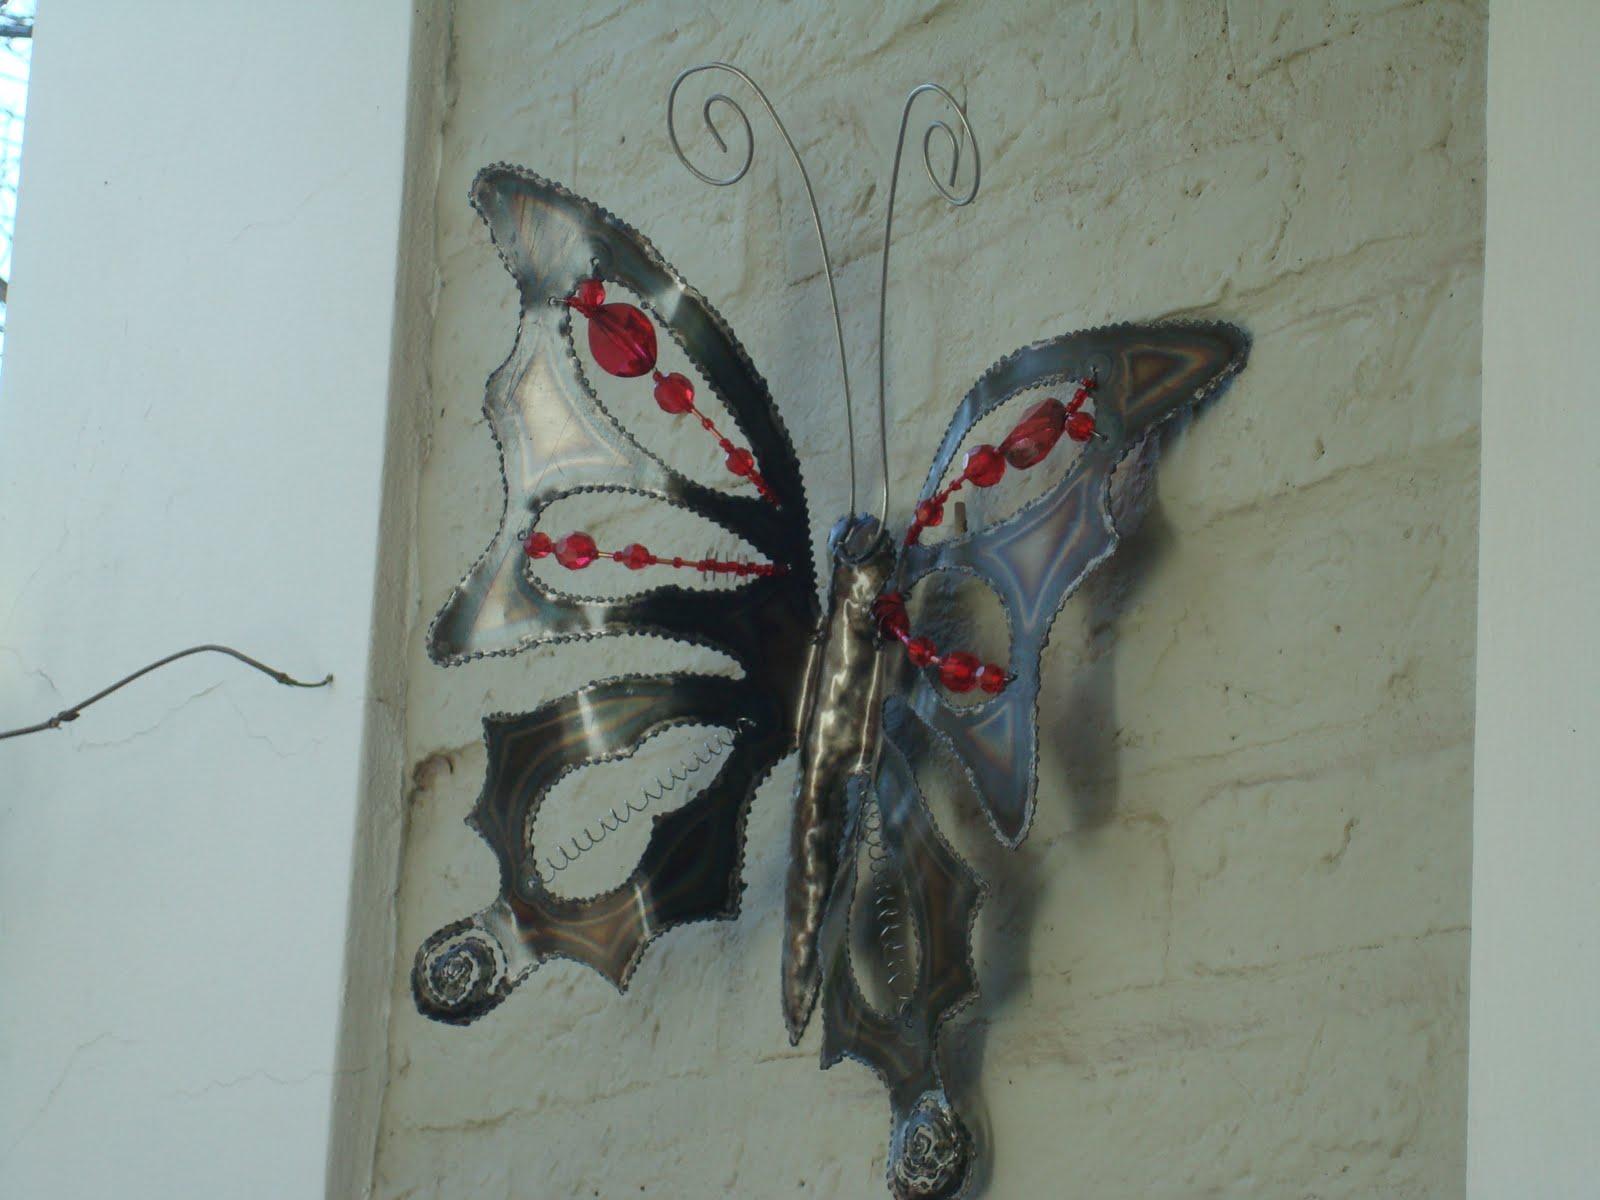 Jardin de lata mariposas y libelulas se posaron en for Jardines en lata